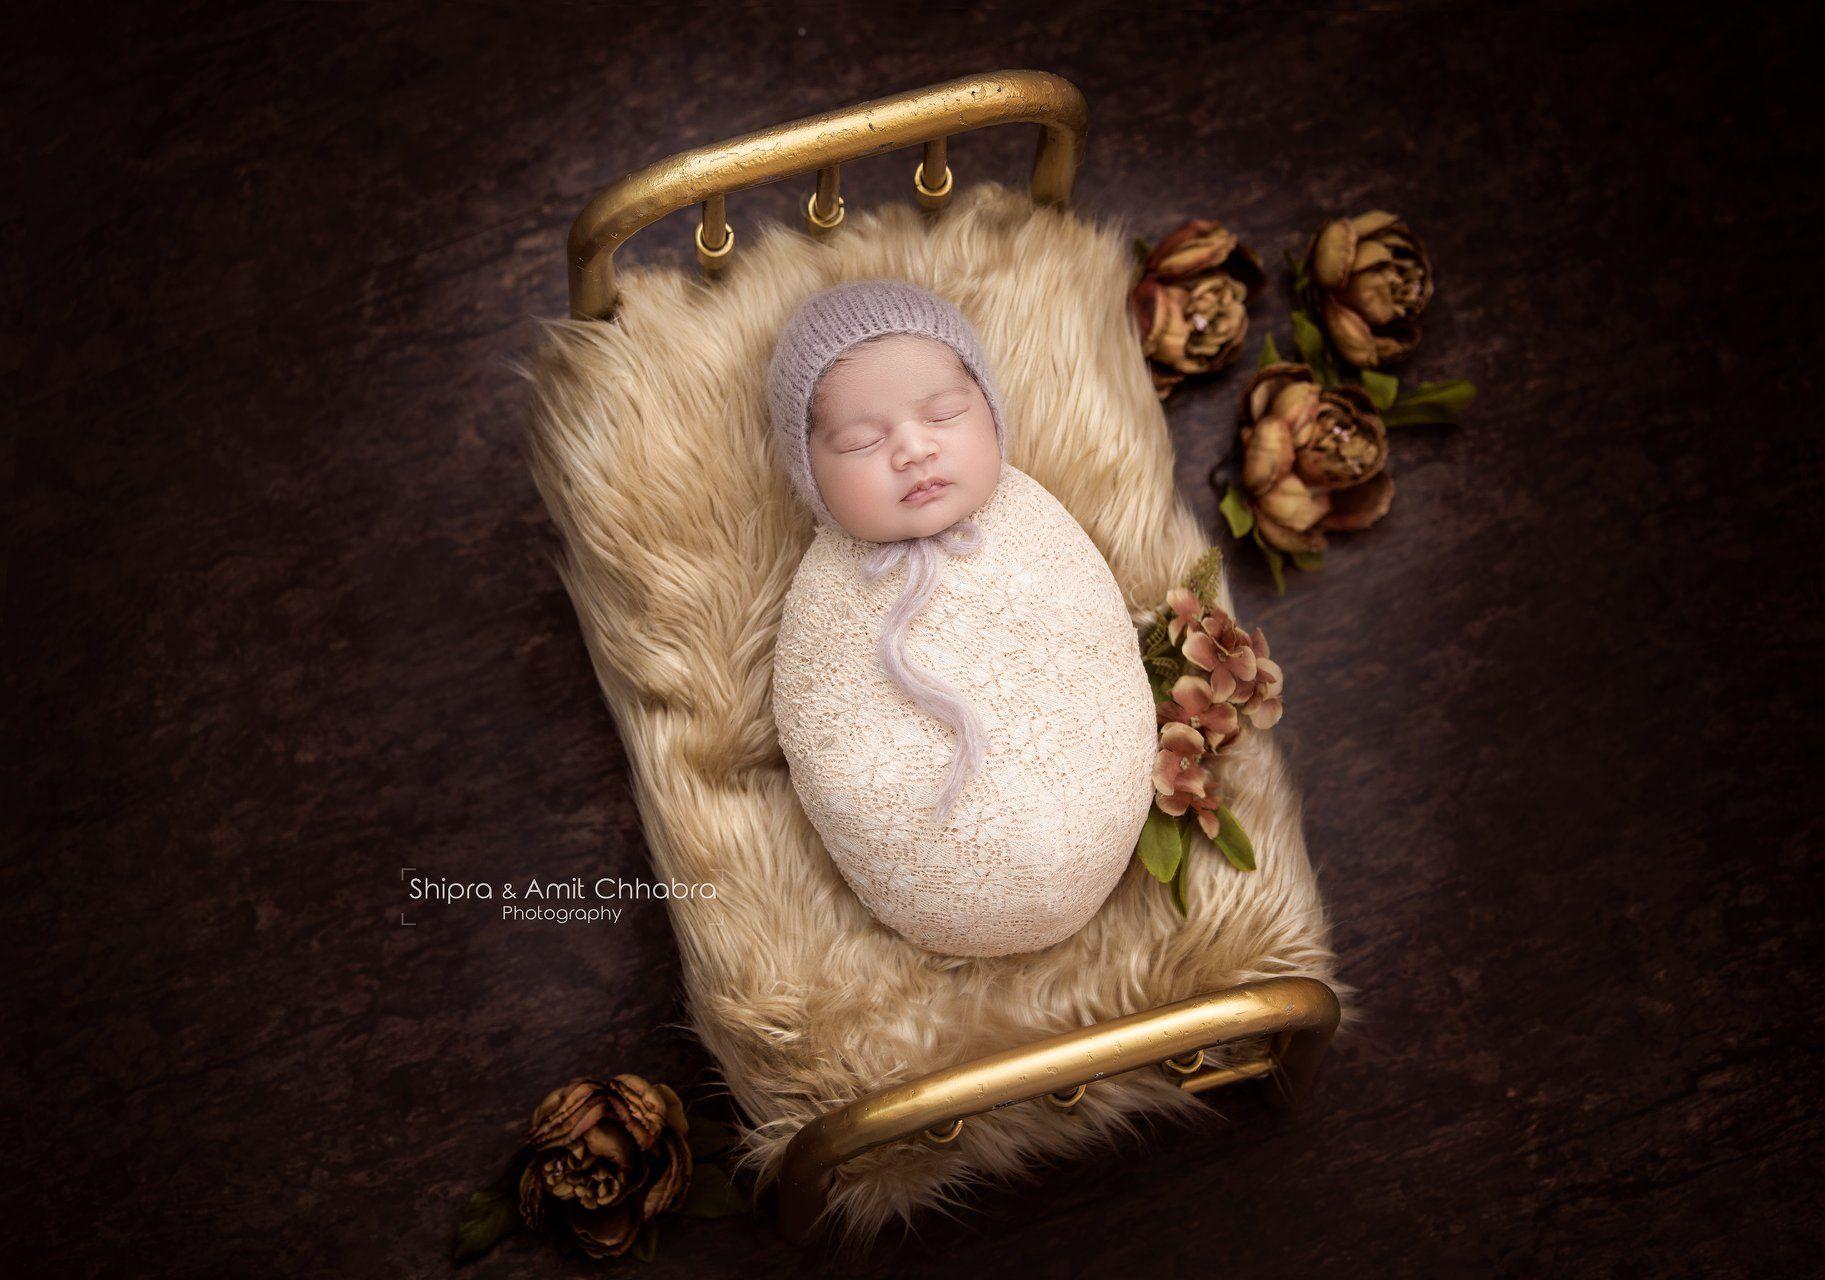 Photo shoot baby girl photoshoot newborn wraps newborn hats vintage look golden bed prop beige fur shipra amit chhabra photography